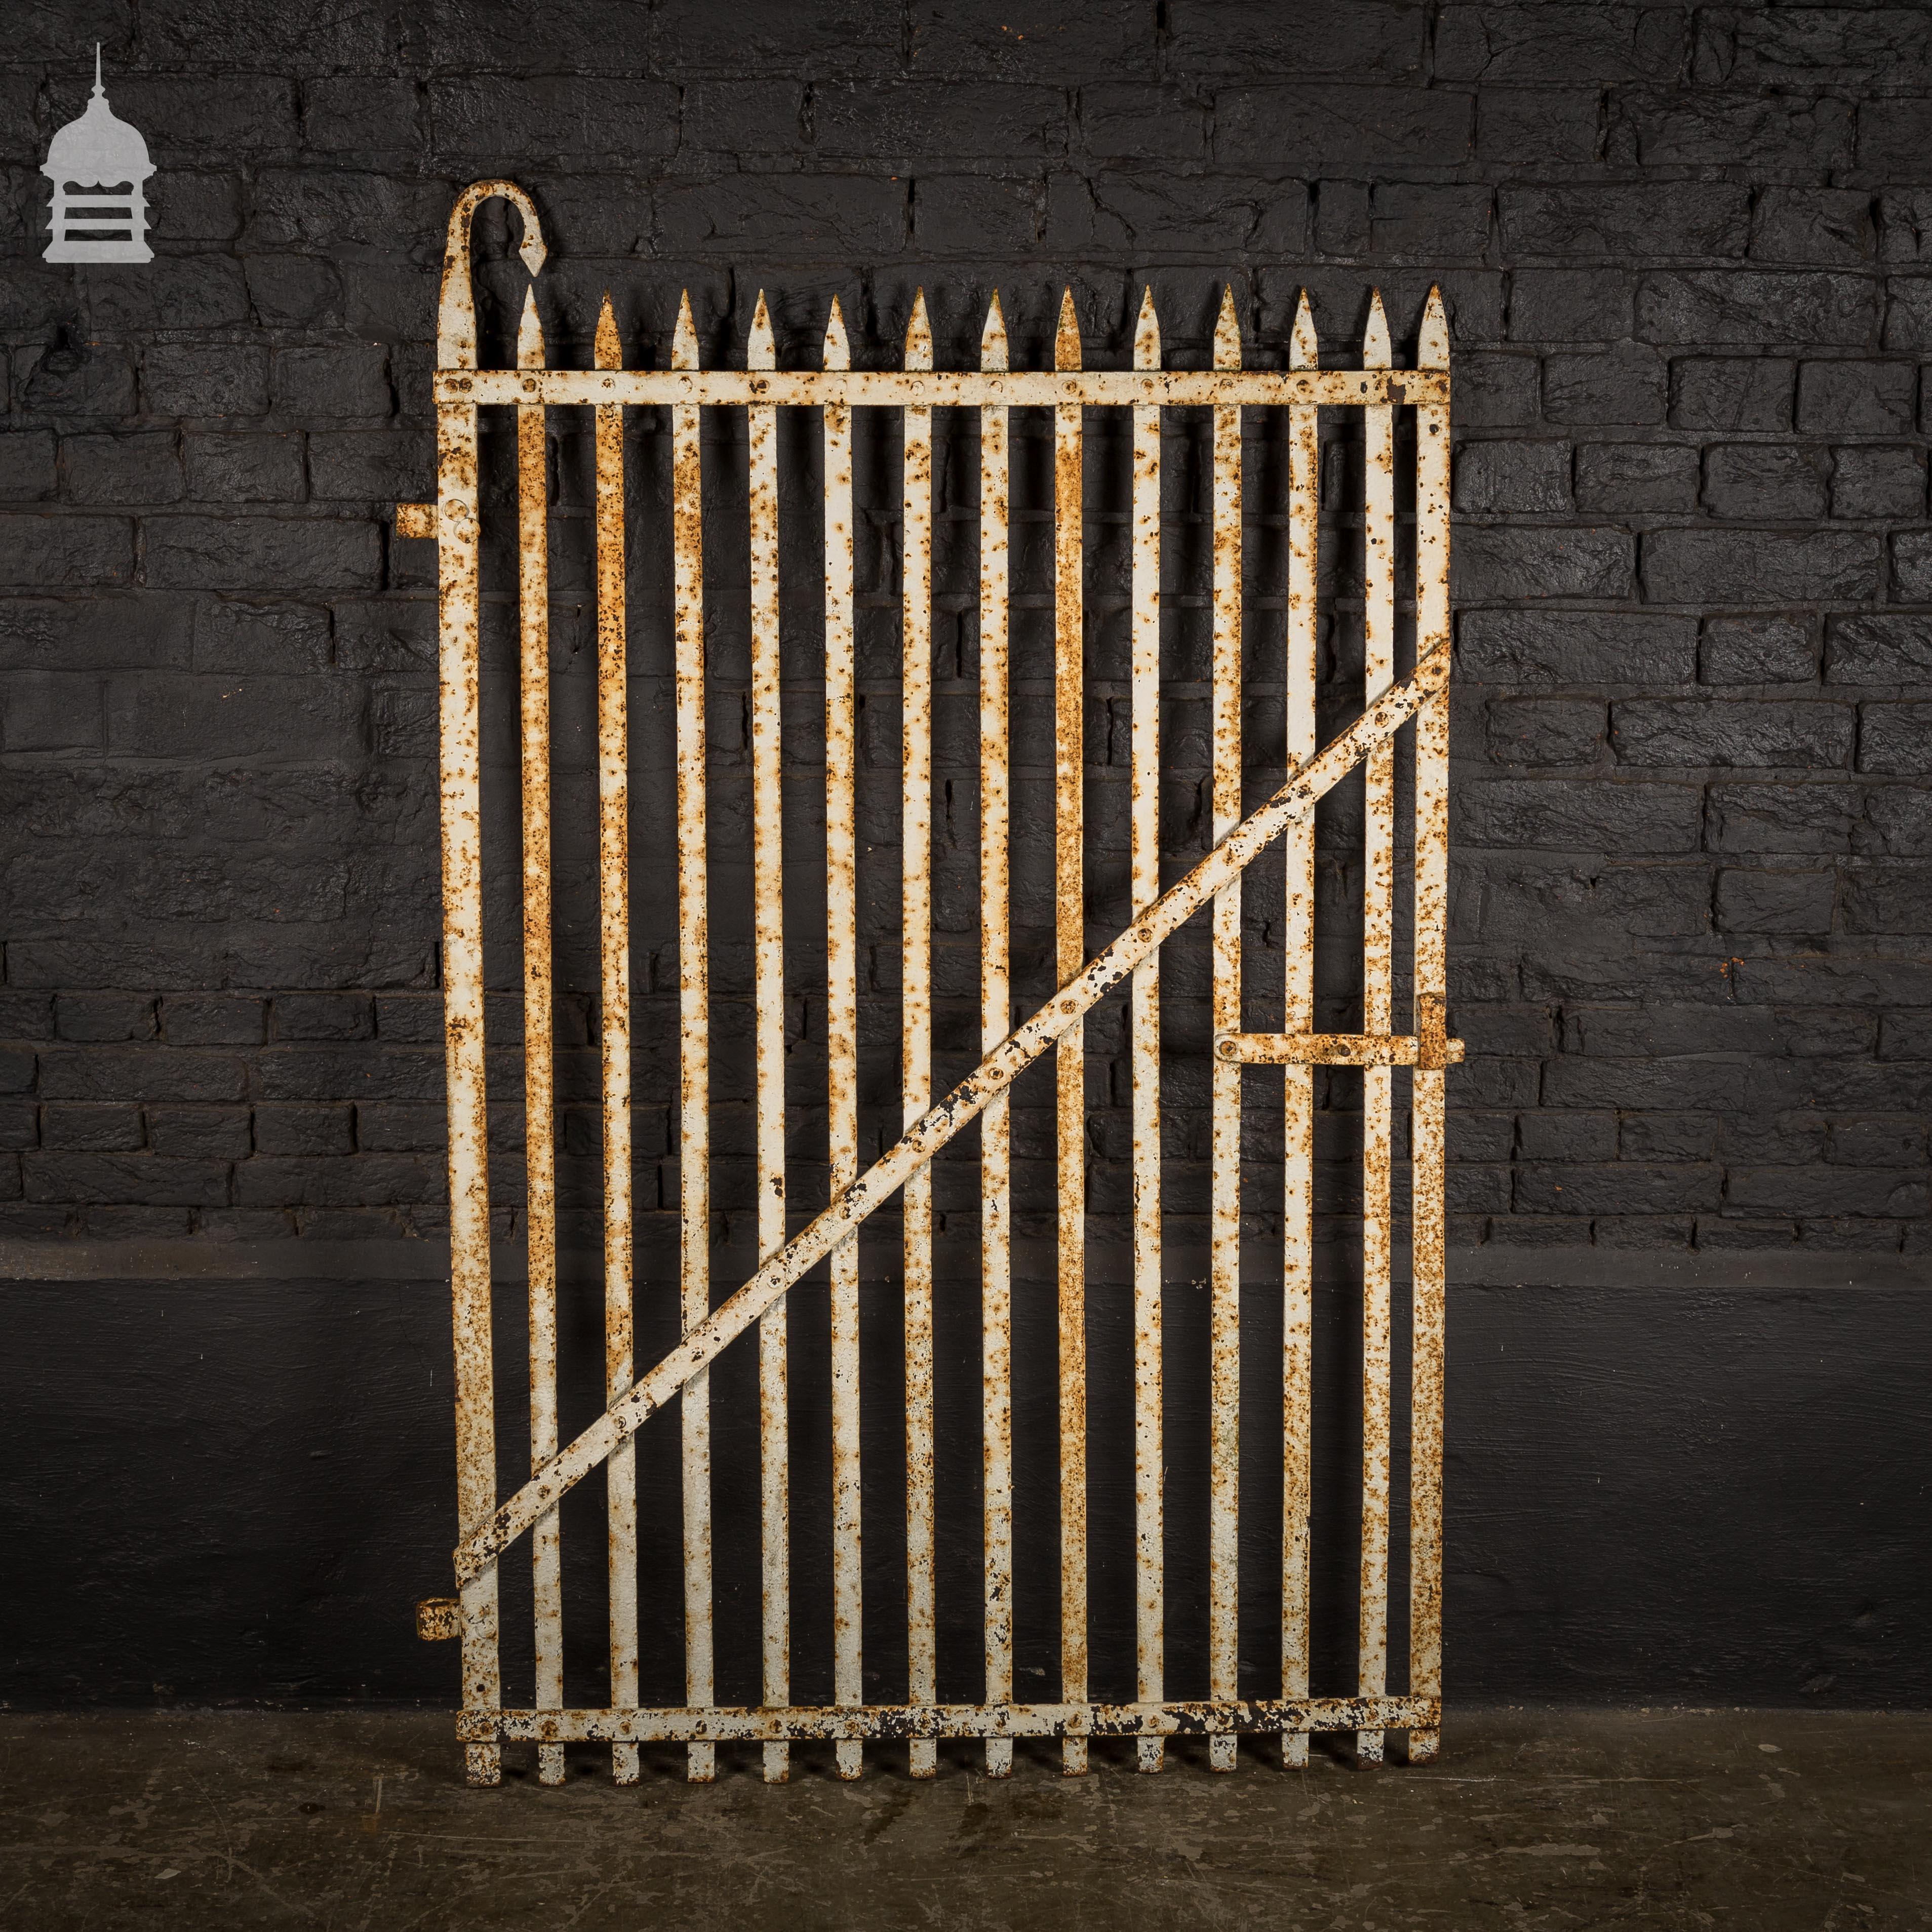 For Sale Georgian Wrought Iron Garden Gate - SalvoWEB UK